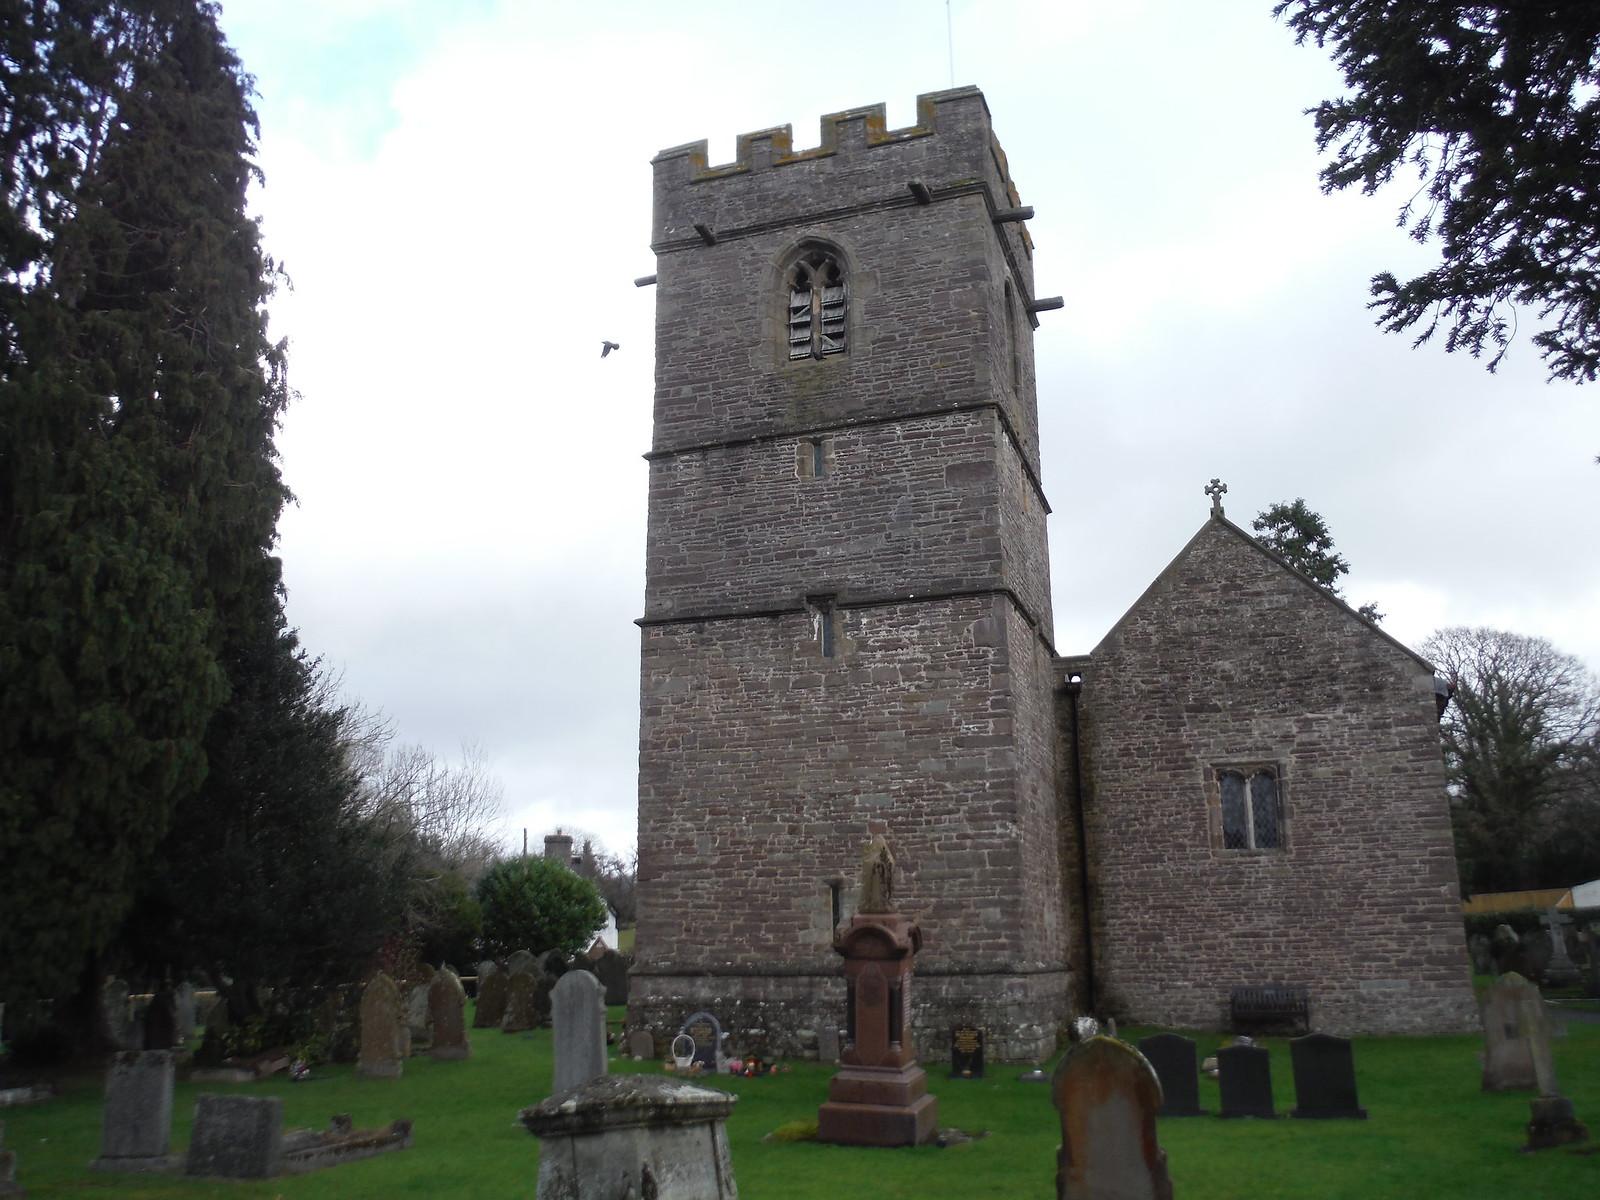 St. Paulinus Church, Llangors SWC Walk 308 - Bwlch Circular (via Mynydd Troed and Llangorse Lake)